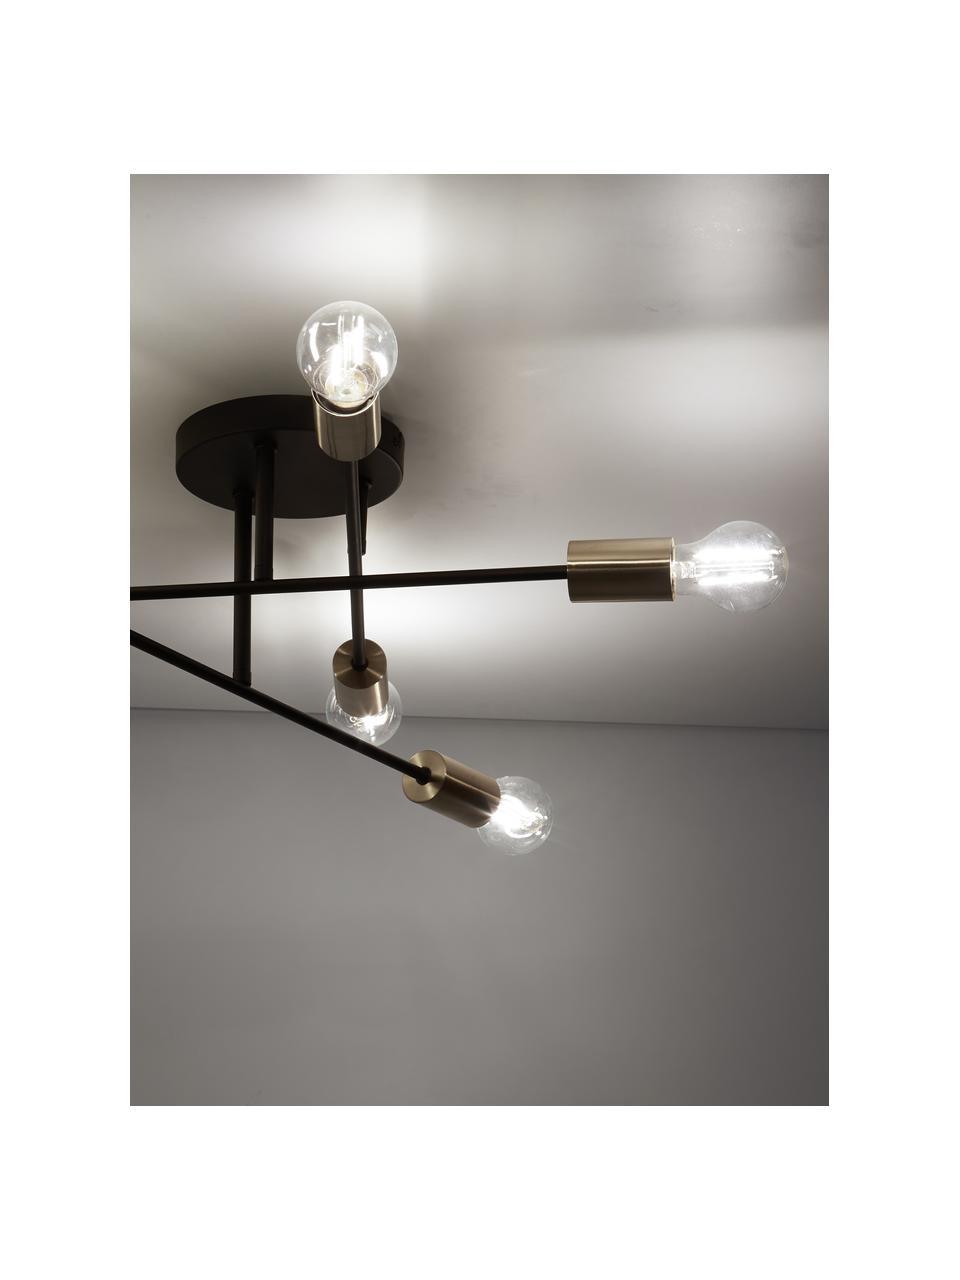 Lampada da soffitto industrial Visby, Baldacchino: metallo verniciato a polv, Paralume: vetro, Nero, Ø 55 x Alt. 20 cm